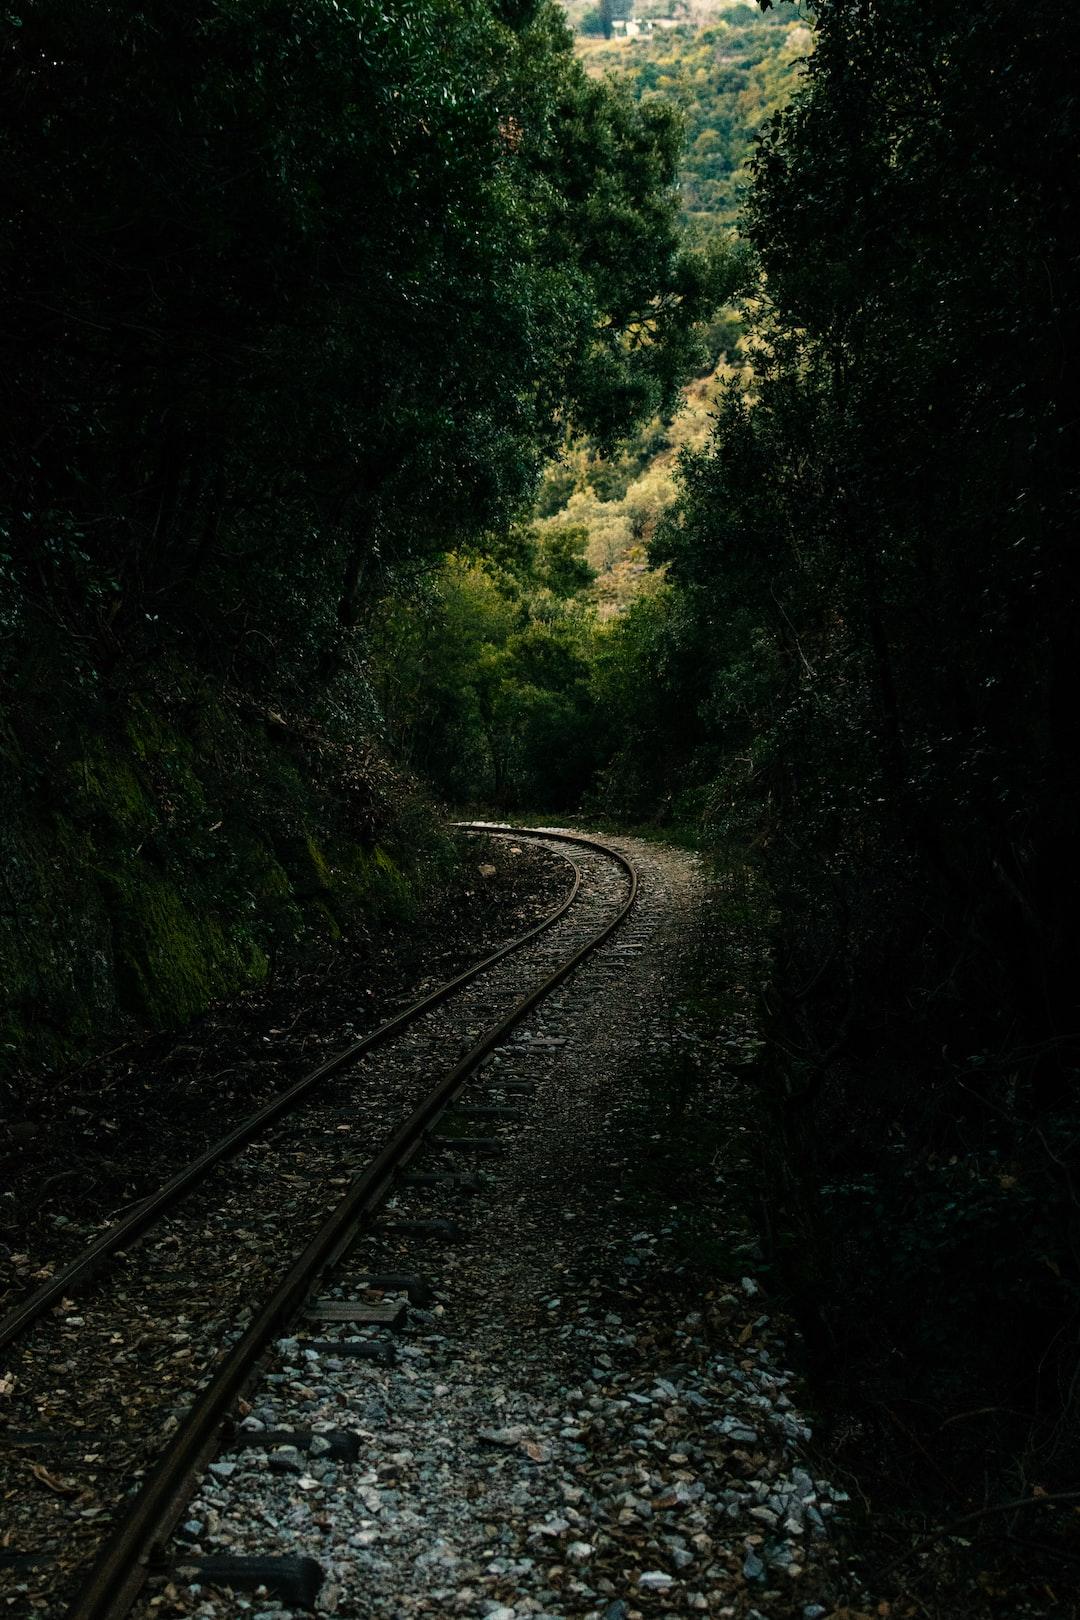 Railroad tracks on a mountain path.